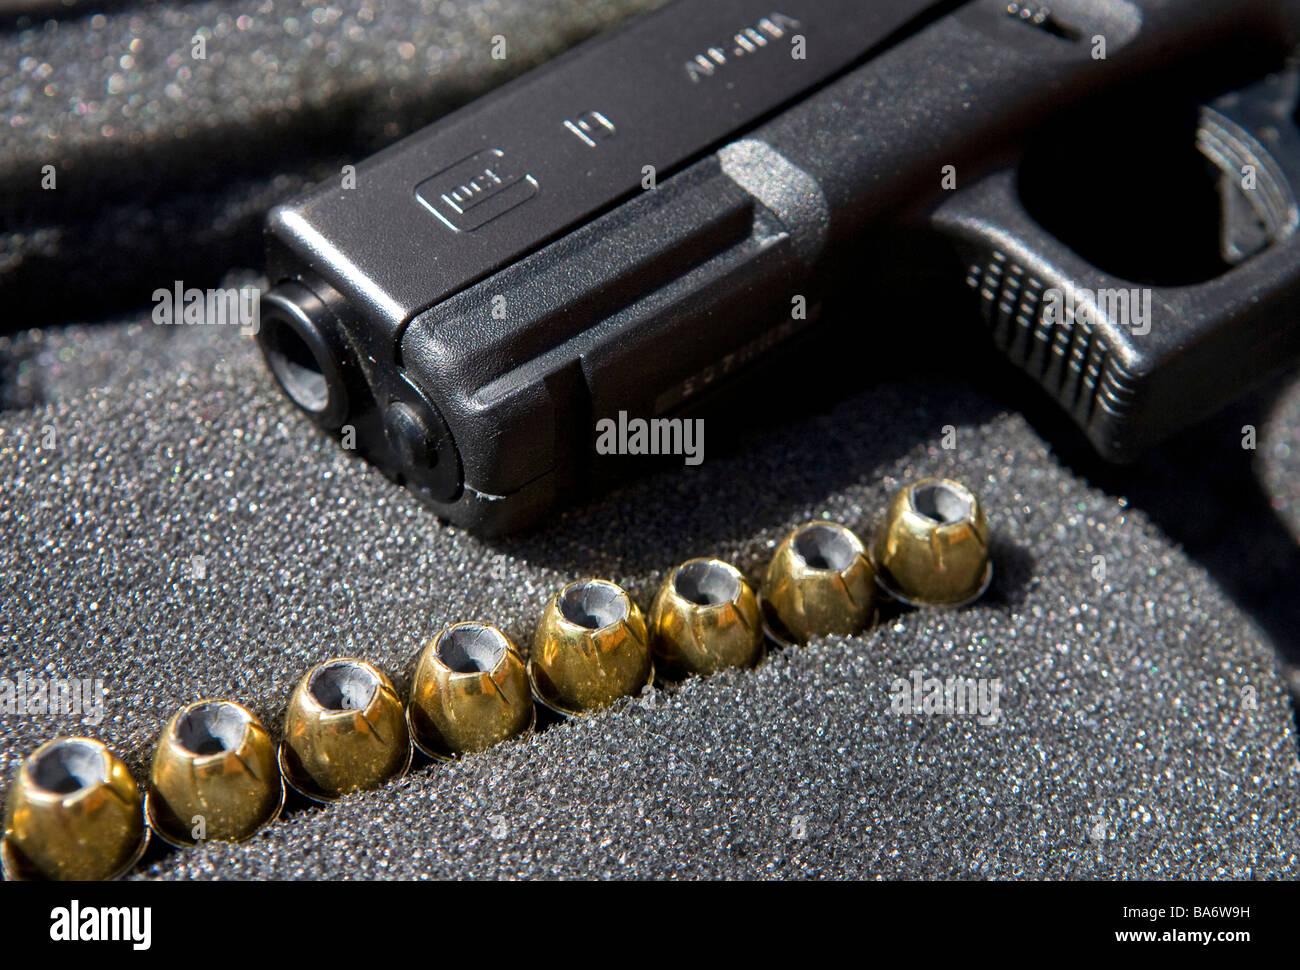 12 April 2009 Frederick Maryland A Glock 9mm handgun and its ammunition - Stock Image